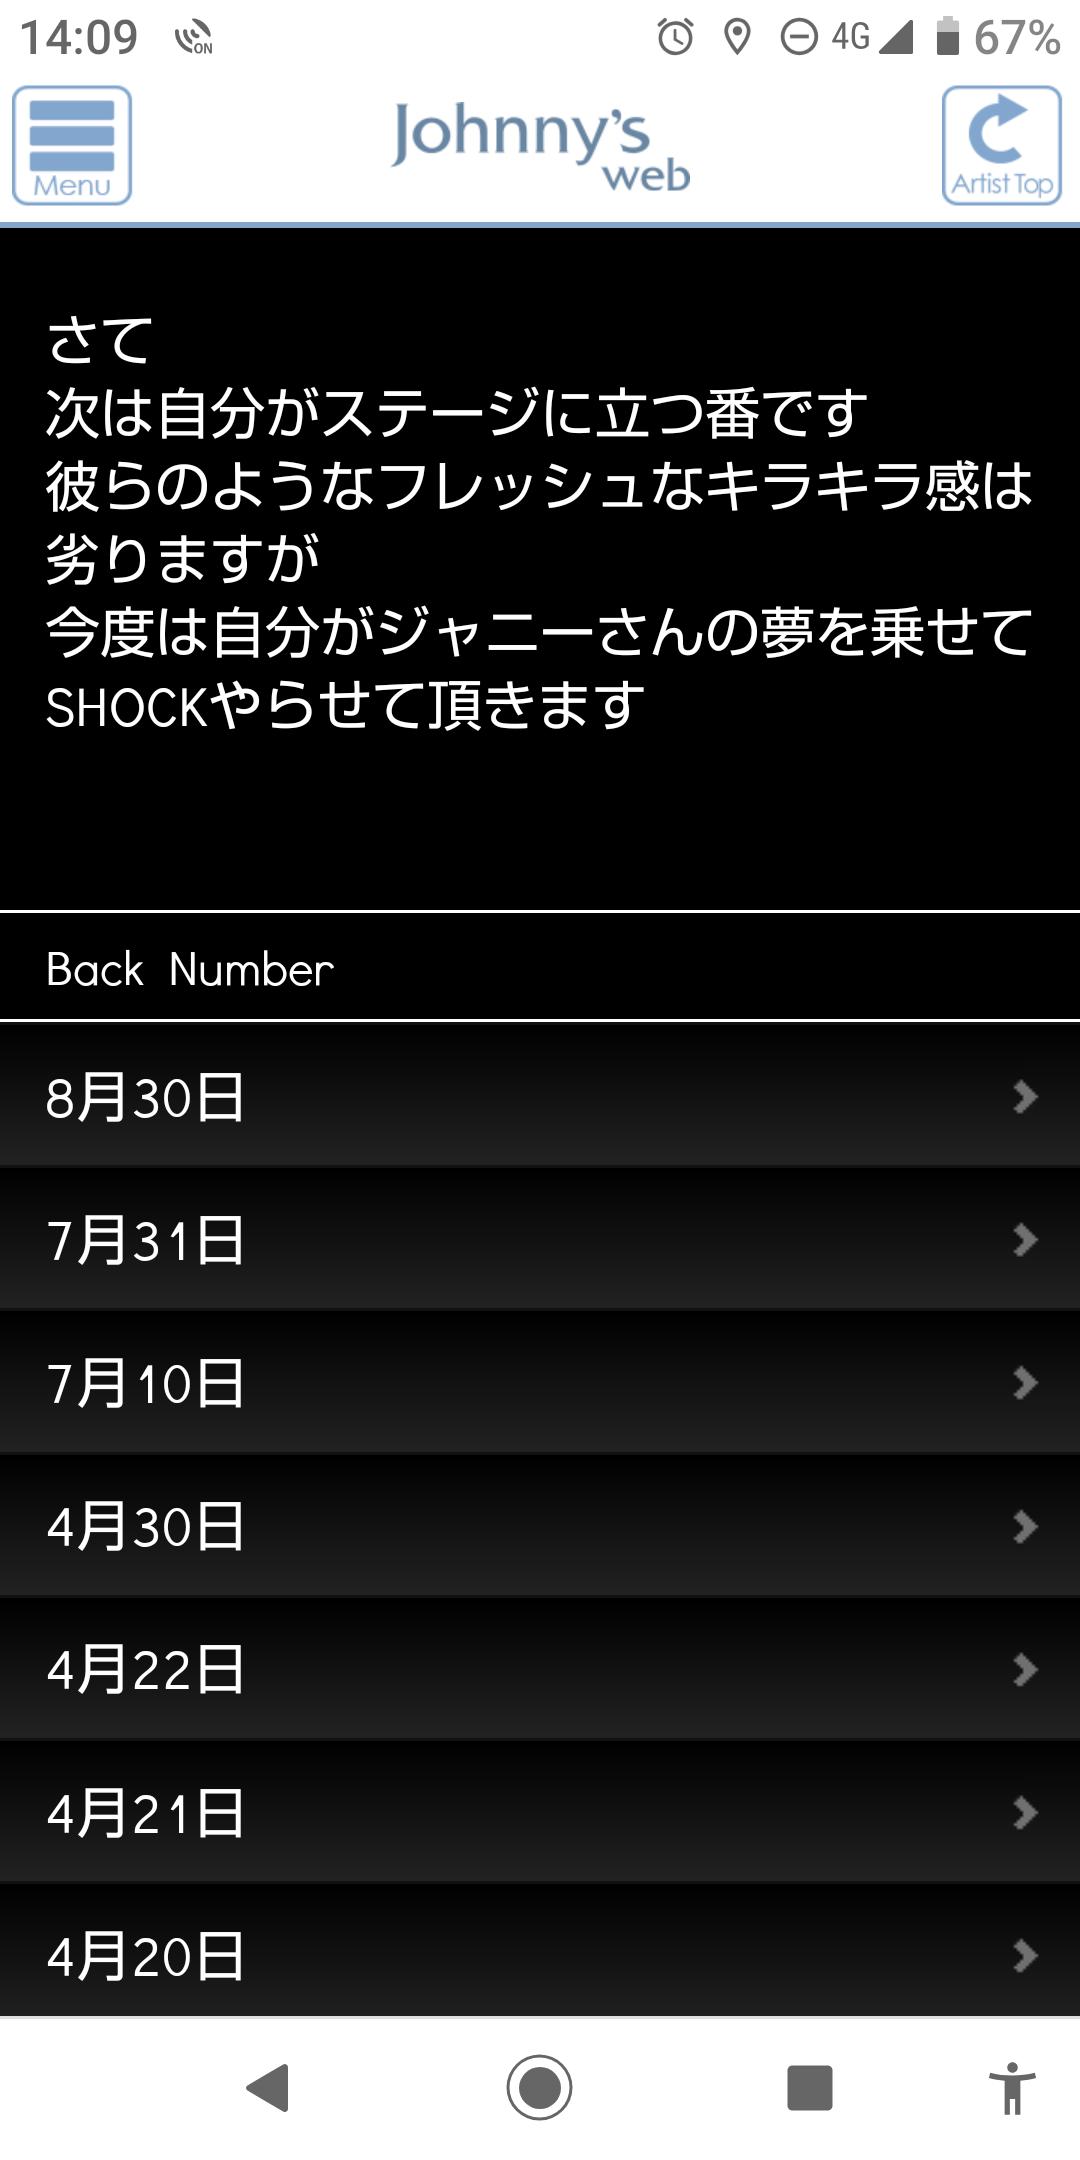 Screenshot_20190904-140954